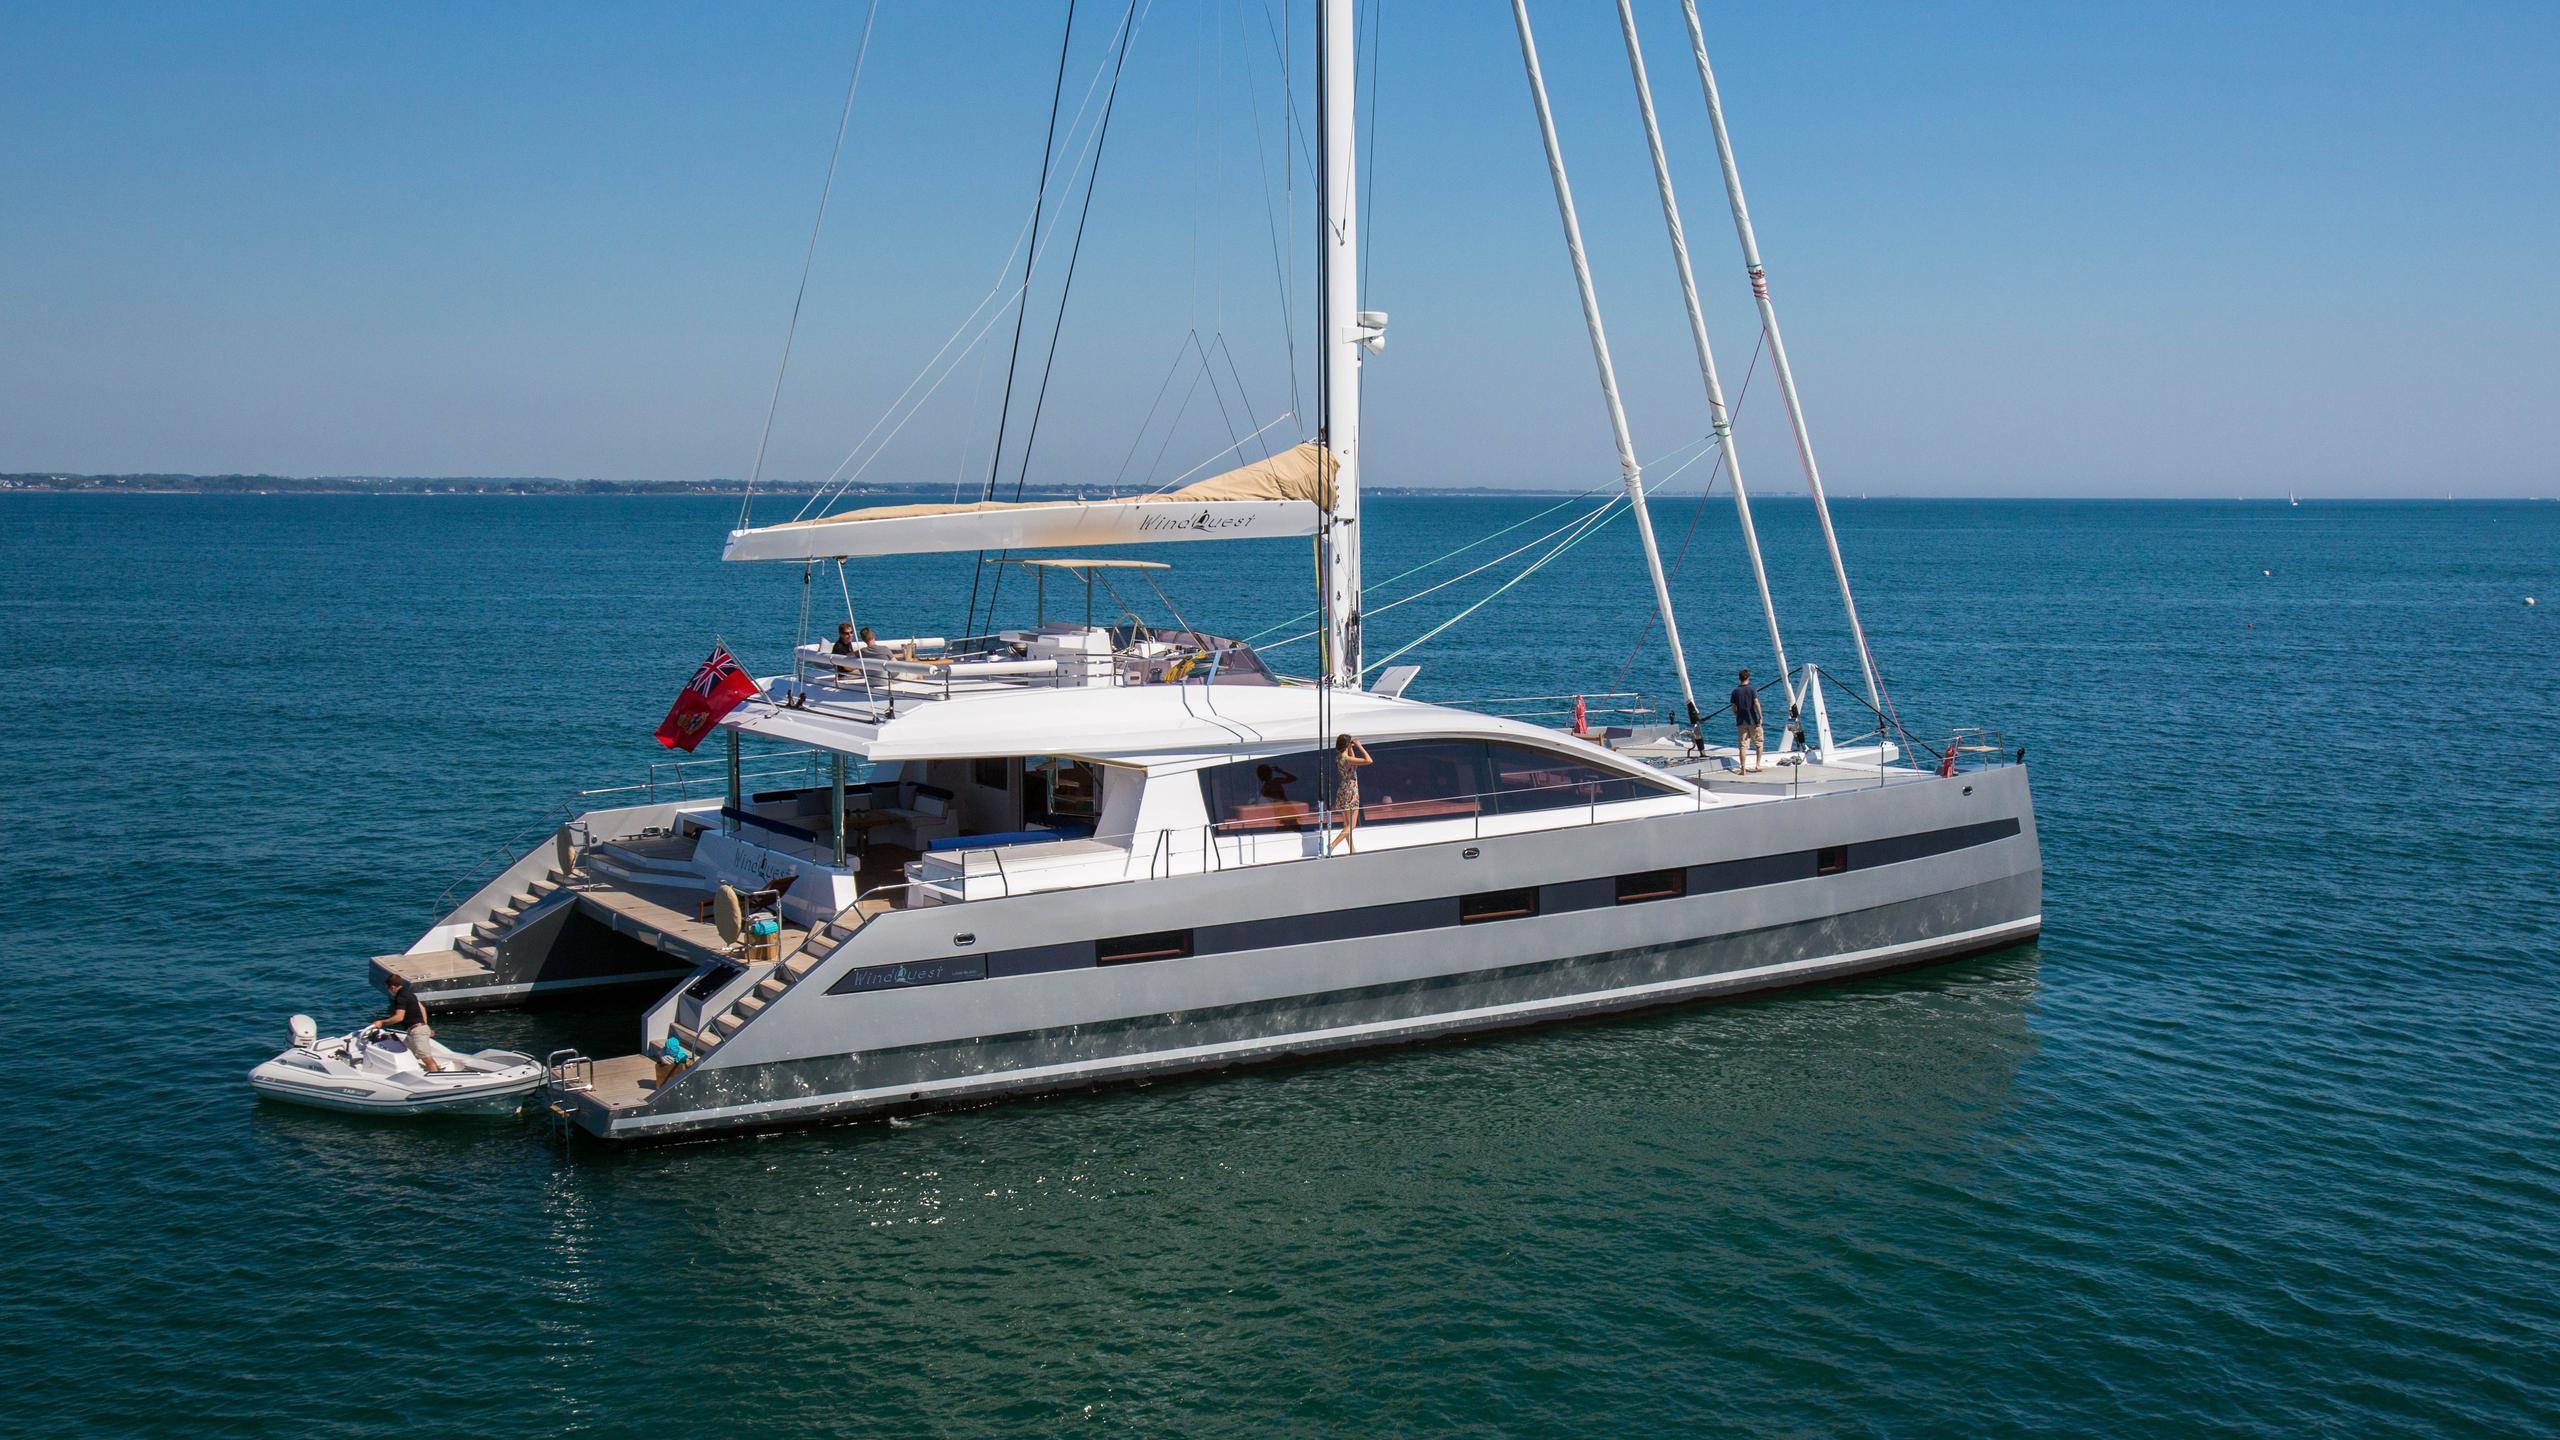 Windquest-catamaran-yacht-jfa-2014-26m-moored-half-profile